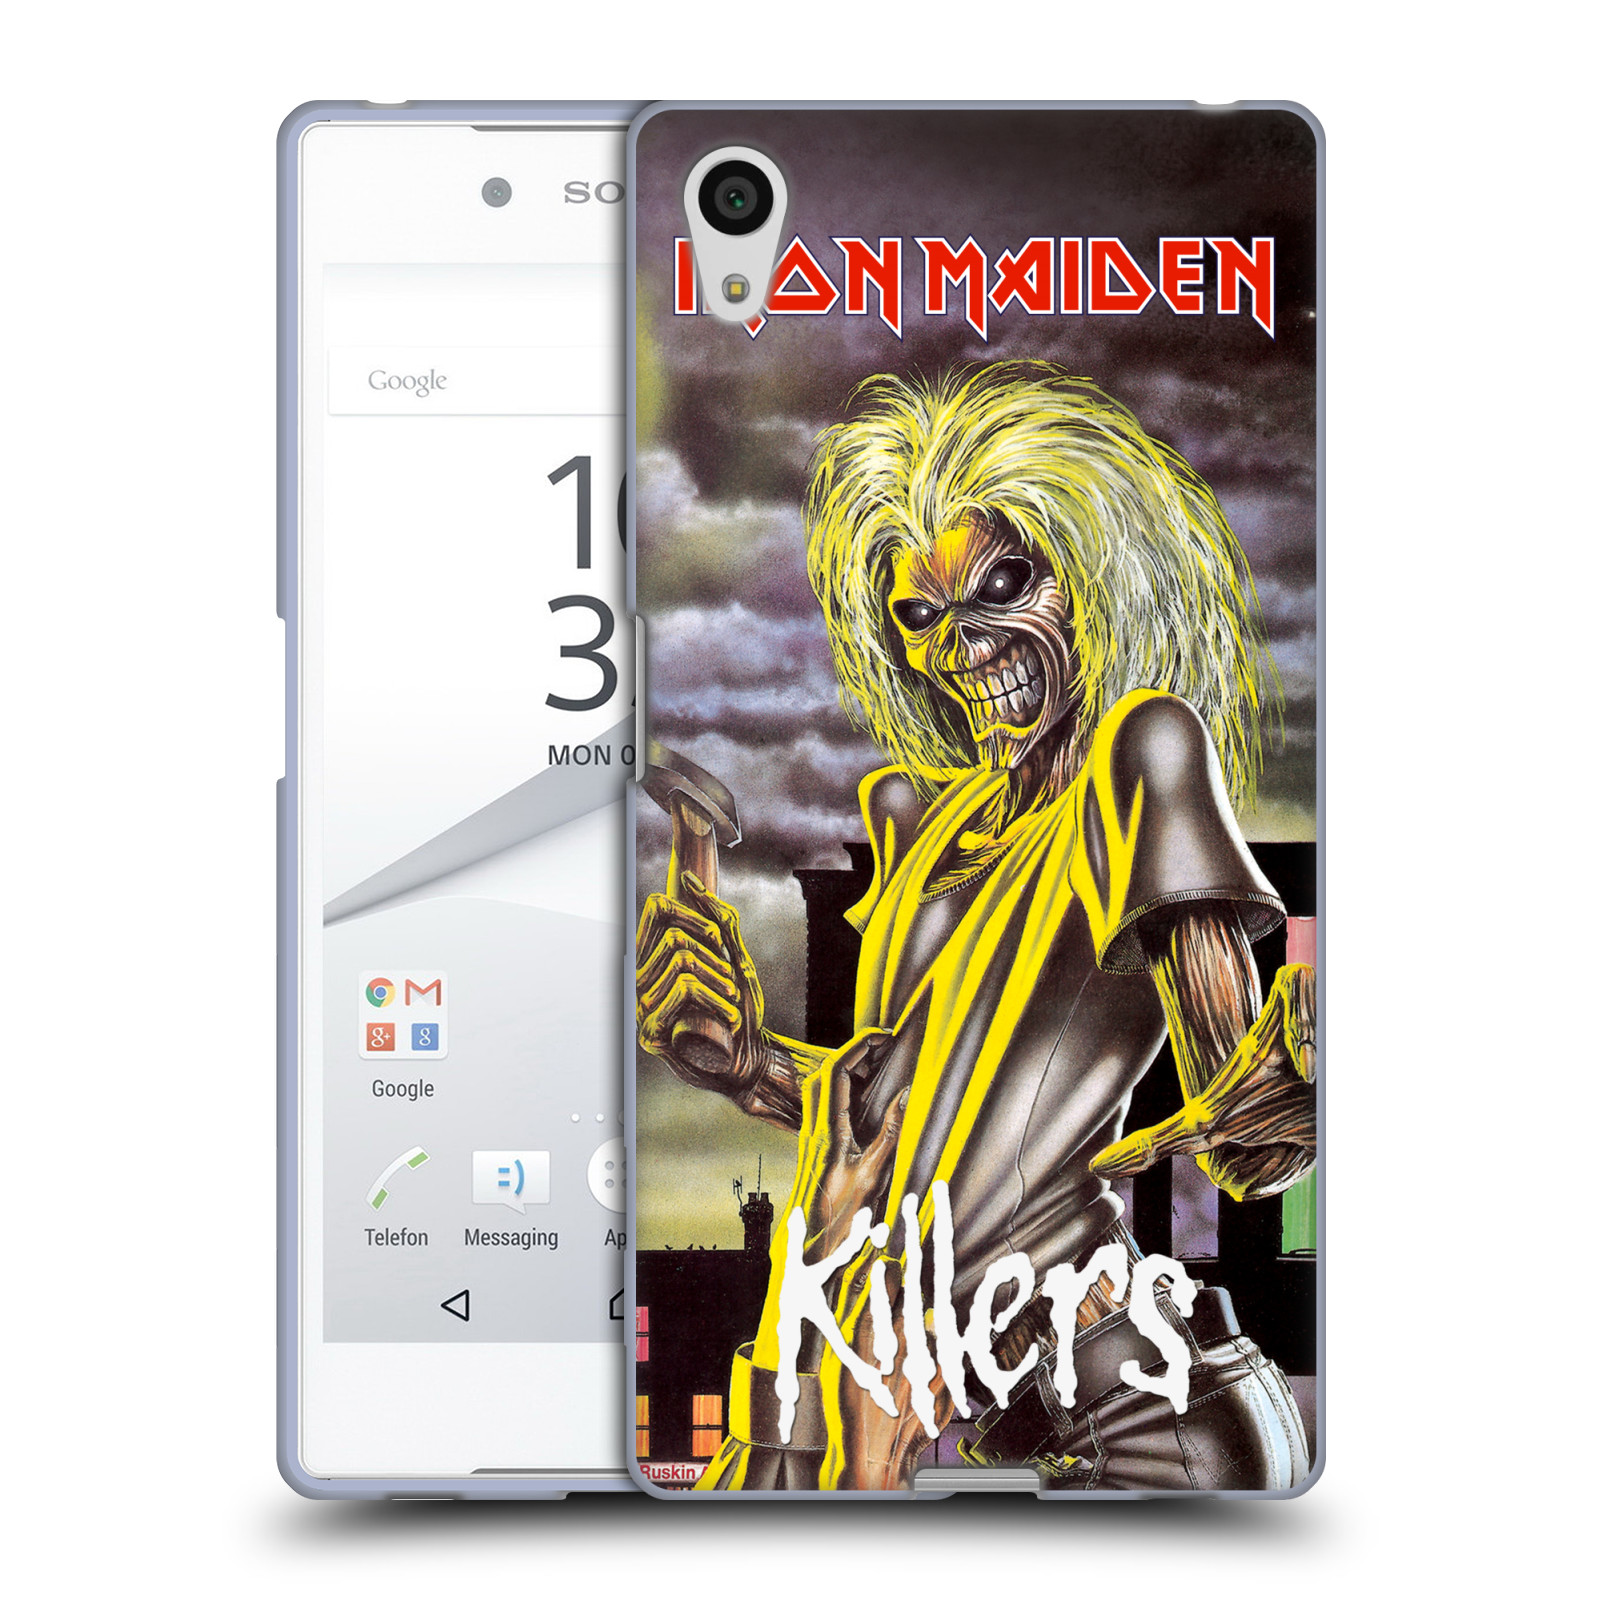 Silikonové pouzdro na mobil Sony Xperia Z5 HEAD CASE - Iron Maiden - Killers (Silikonový kryt či obal na mobilní telefon s licencovaným motivem Iron Maiden Sony Xperia Z5 E6653)